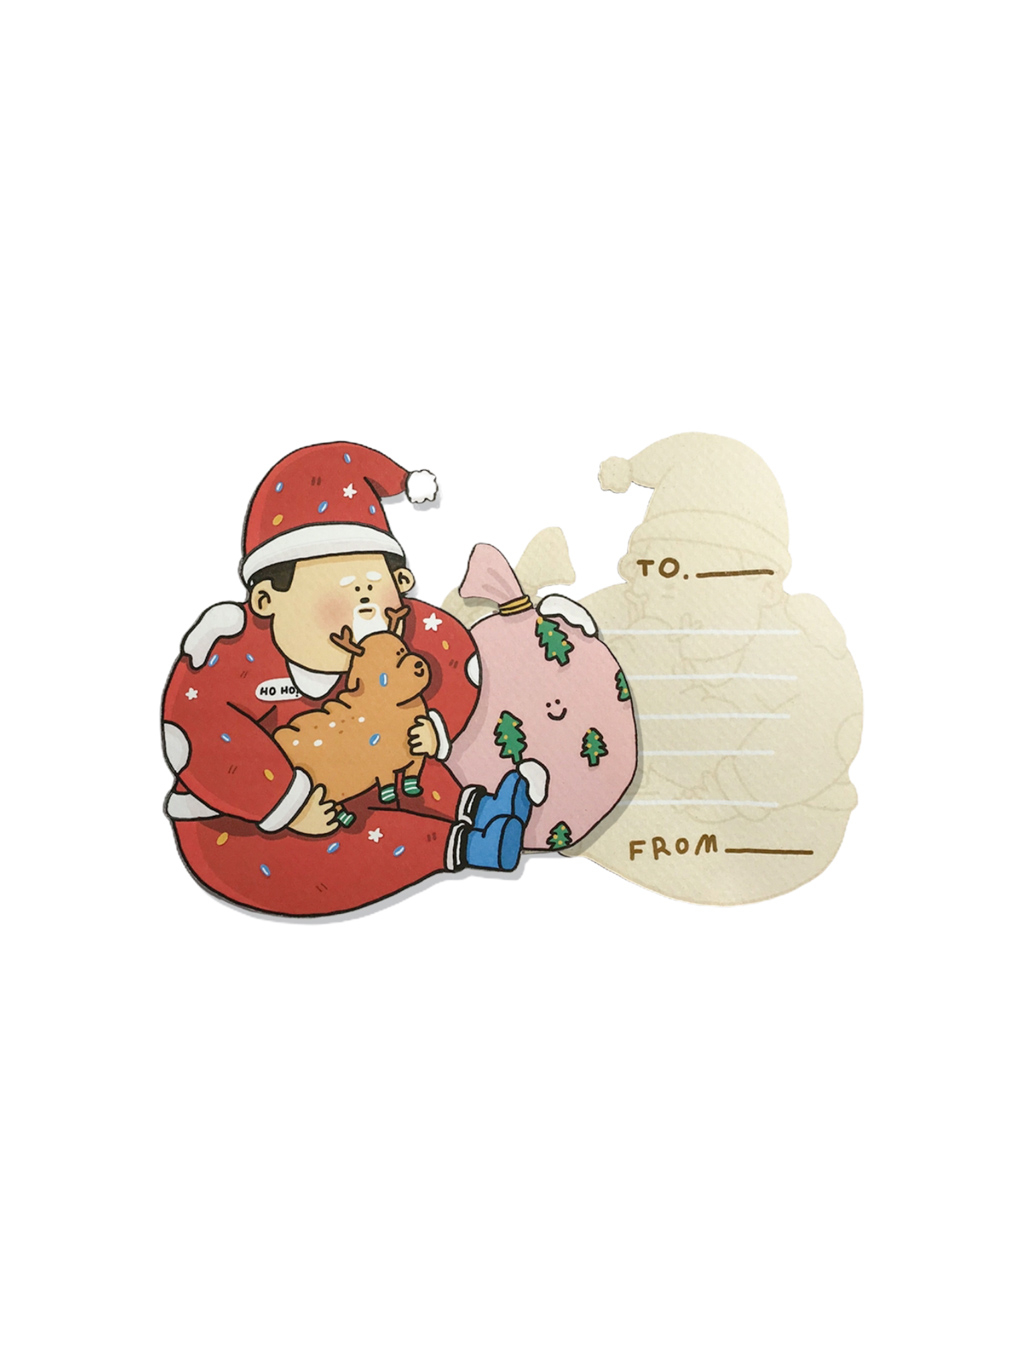 Die Cut Postcard - Fat Santa